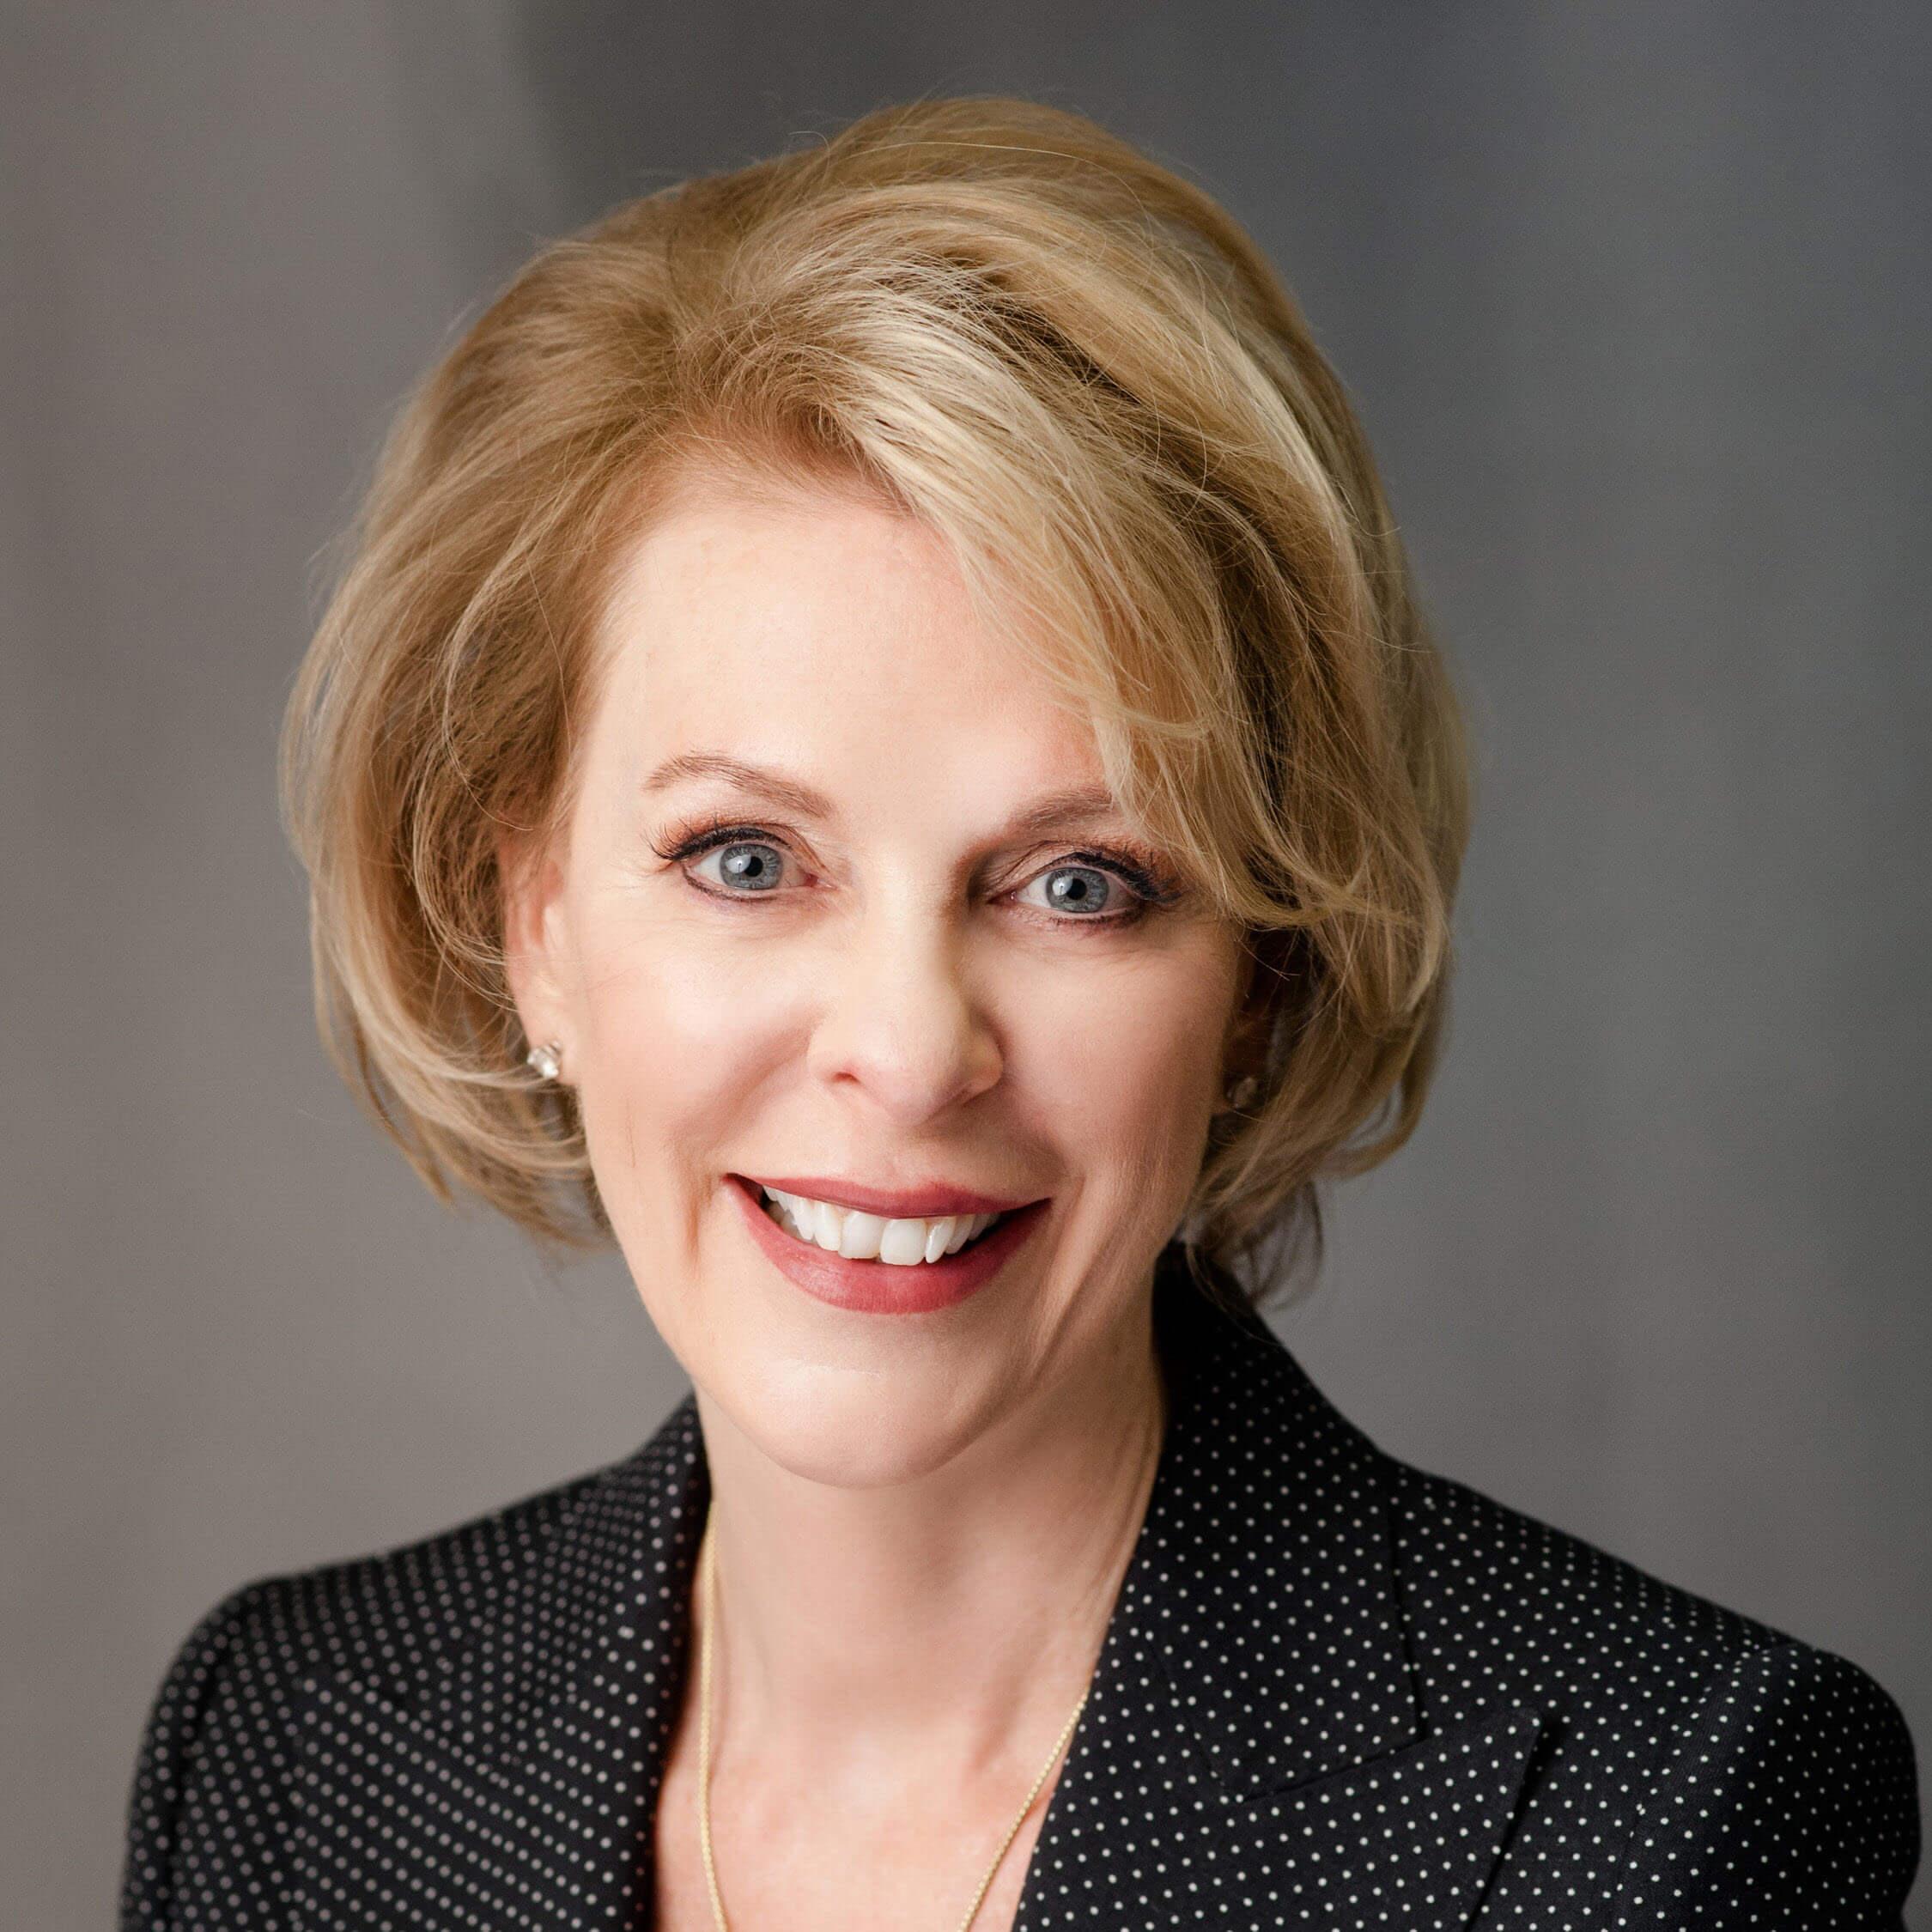 Elizabeth Shenkman Headshot